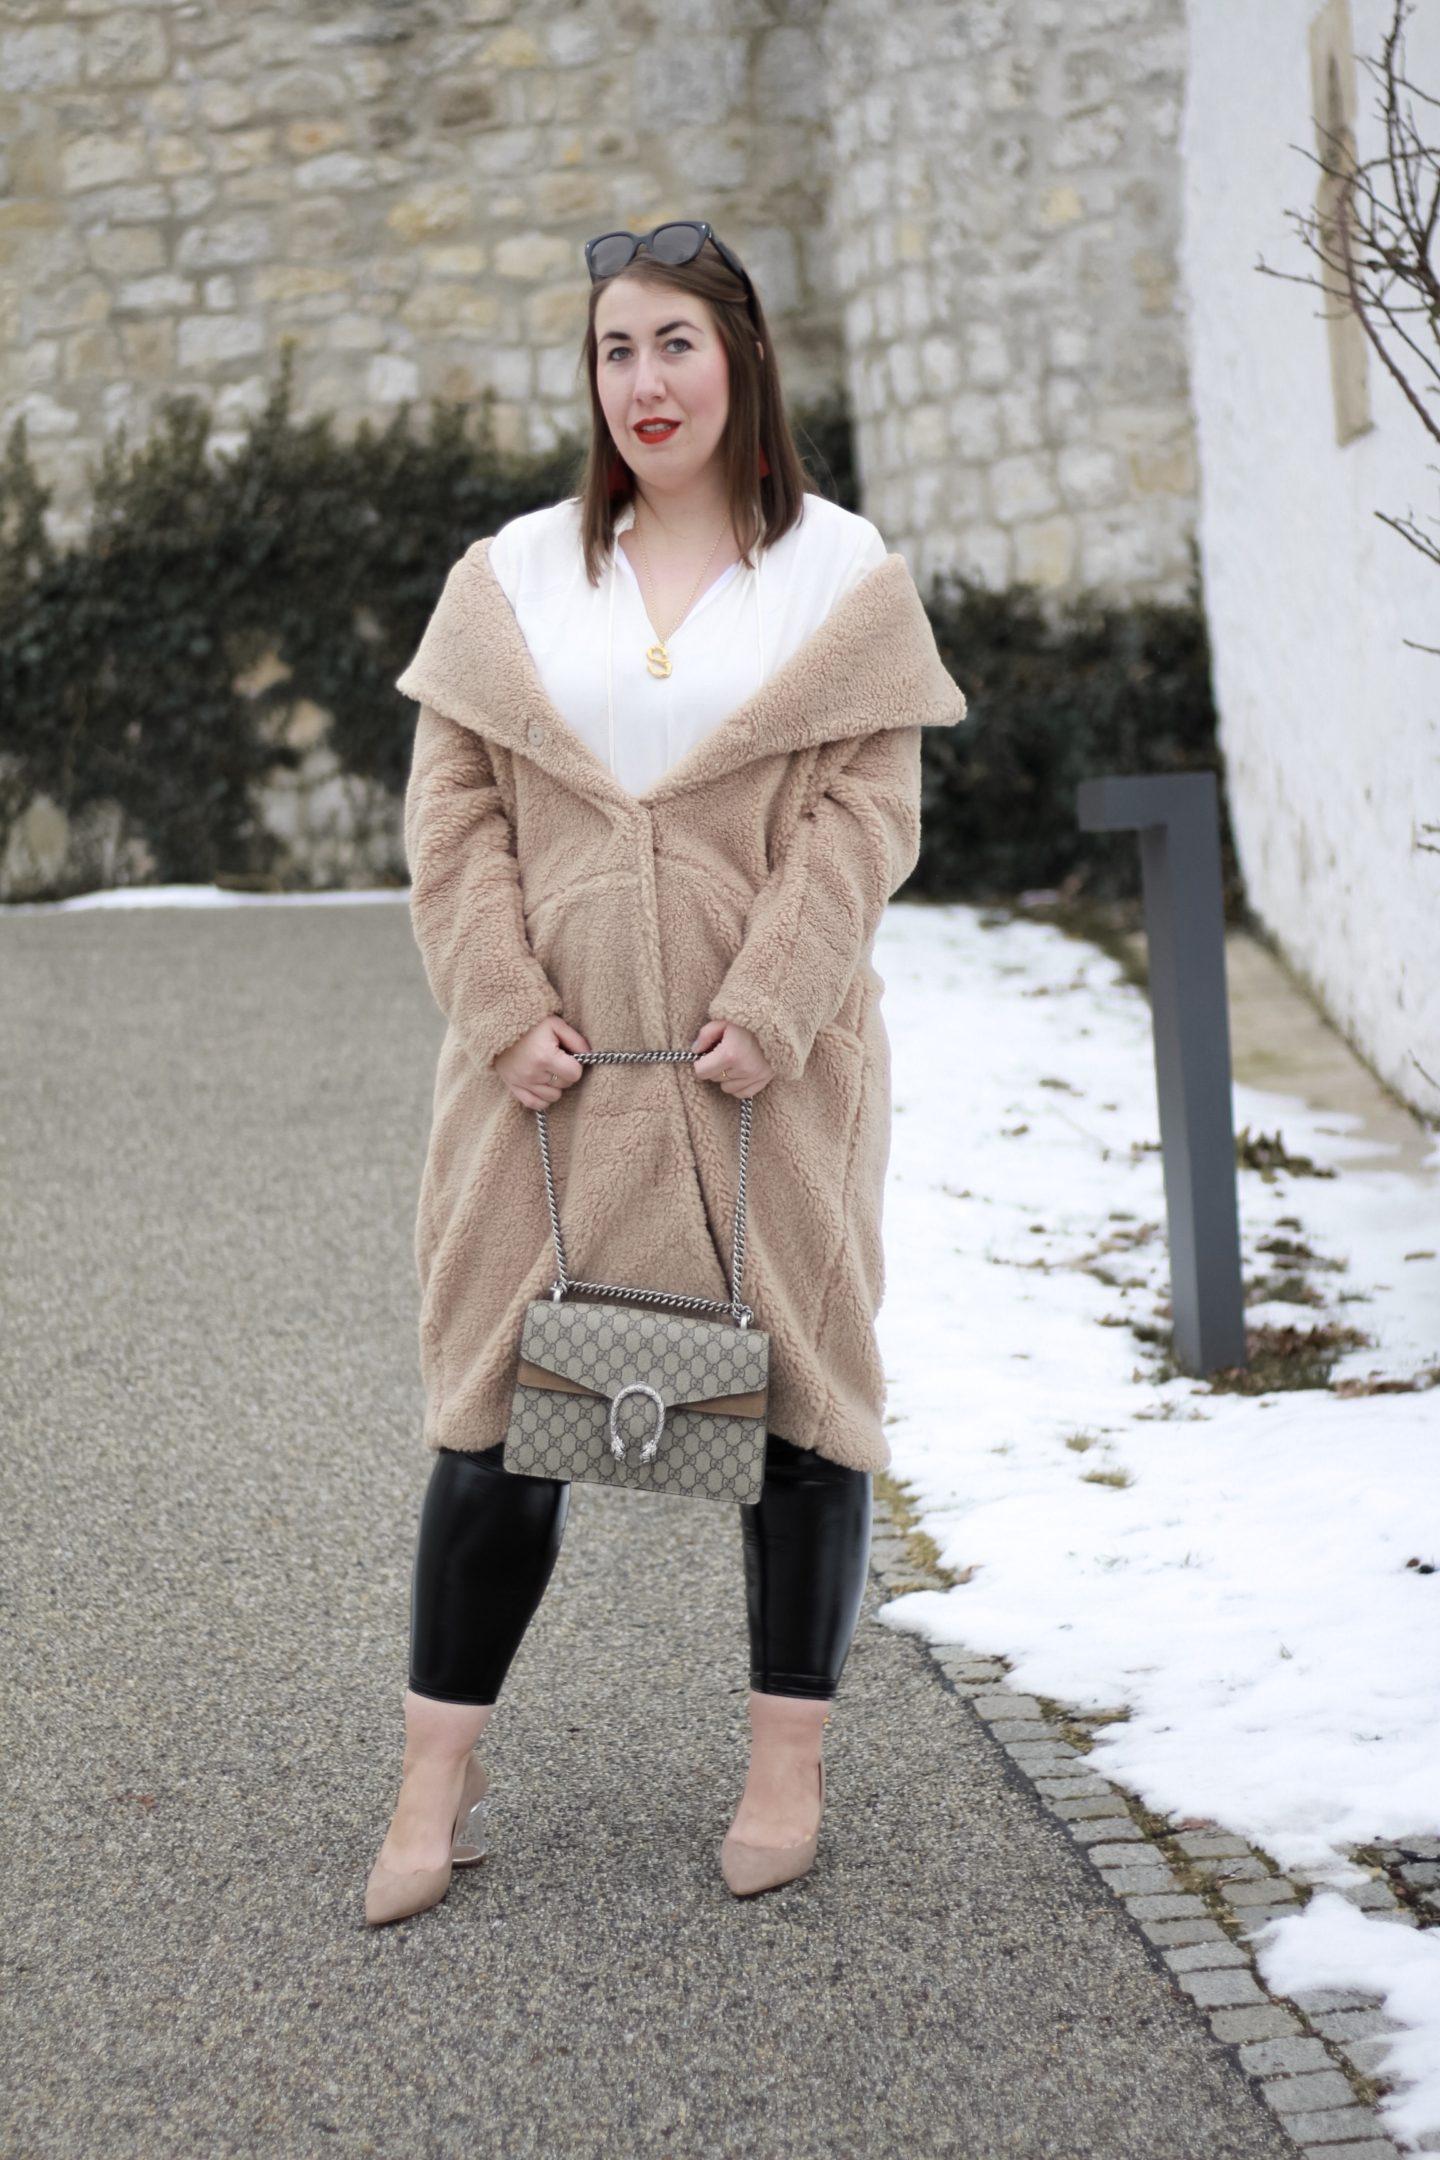 Streetstyle-Trend-Slumping-Teddycoat-Miss-Suzie-Loves-Gucci-Dionysus-Susanne-Heidebach-Teddy-Mantel